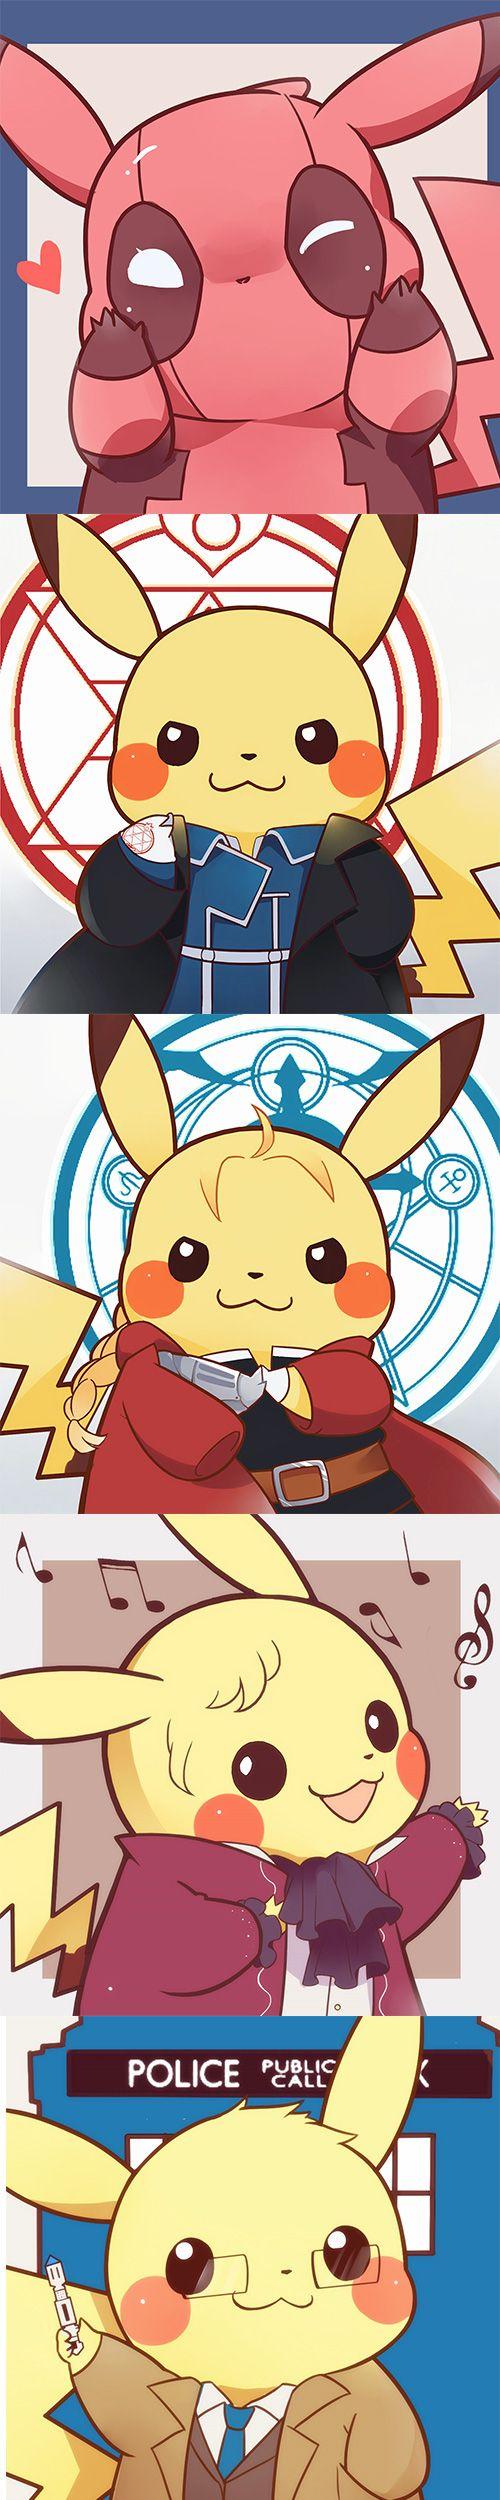 [Pokemon Daliy] Deadpool Pikachu! OMG I SEE DAVID TENNANT PIKACHU I MIGHT HAVE TO DIE NOW